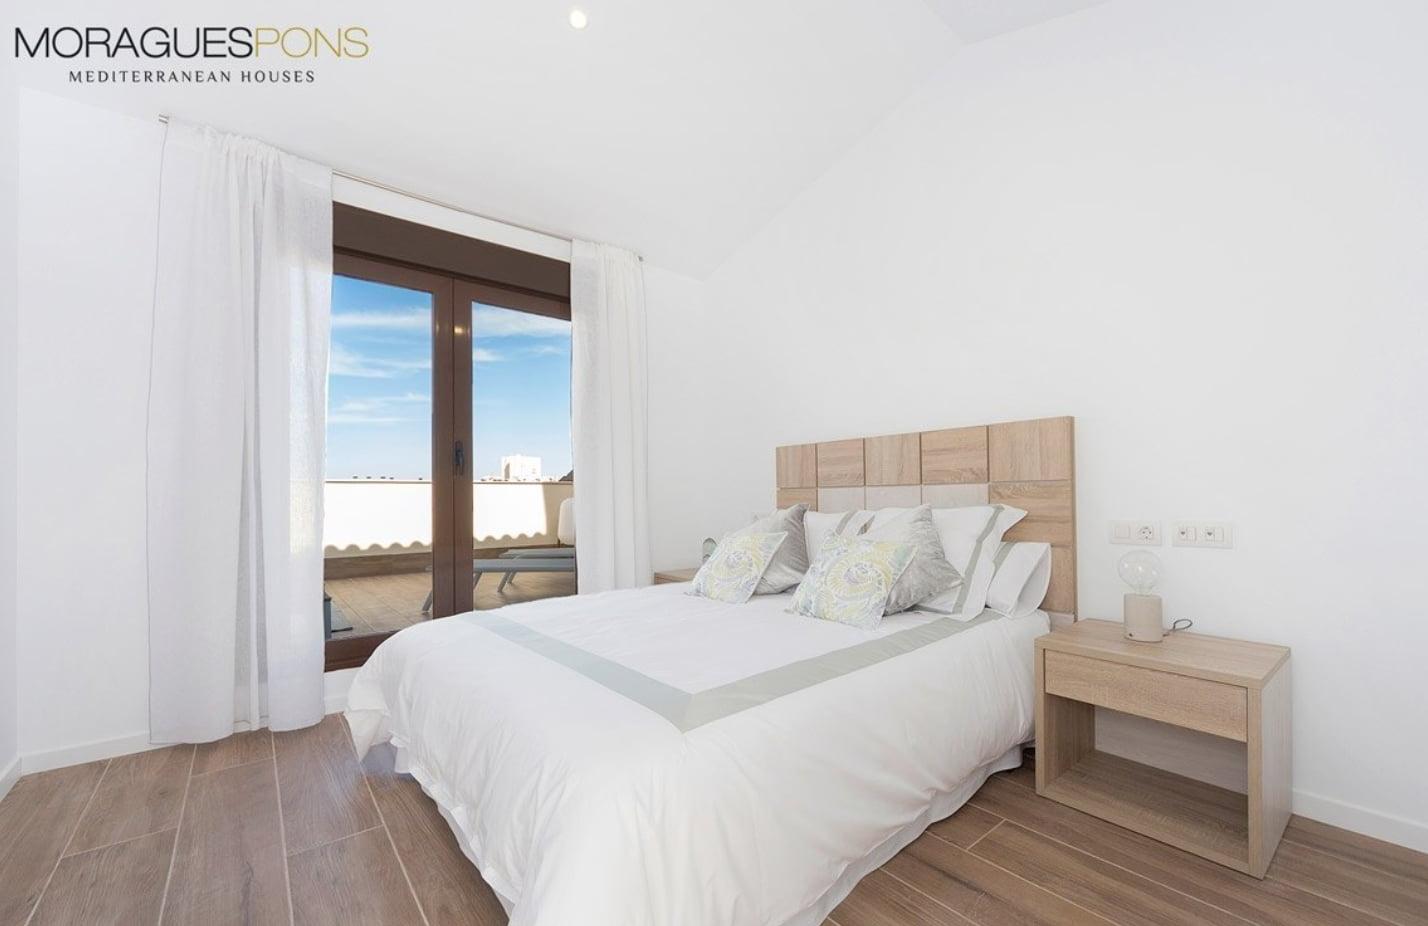 Master-Schlafzimmer MORAGUESPONS Mediterrane Häuser - Jávea.com